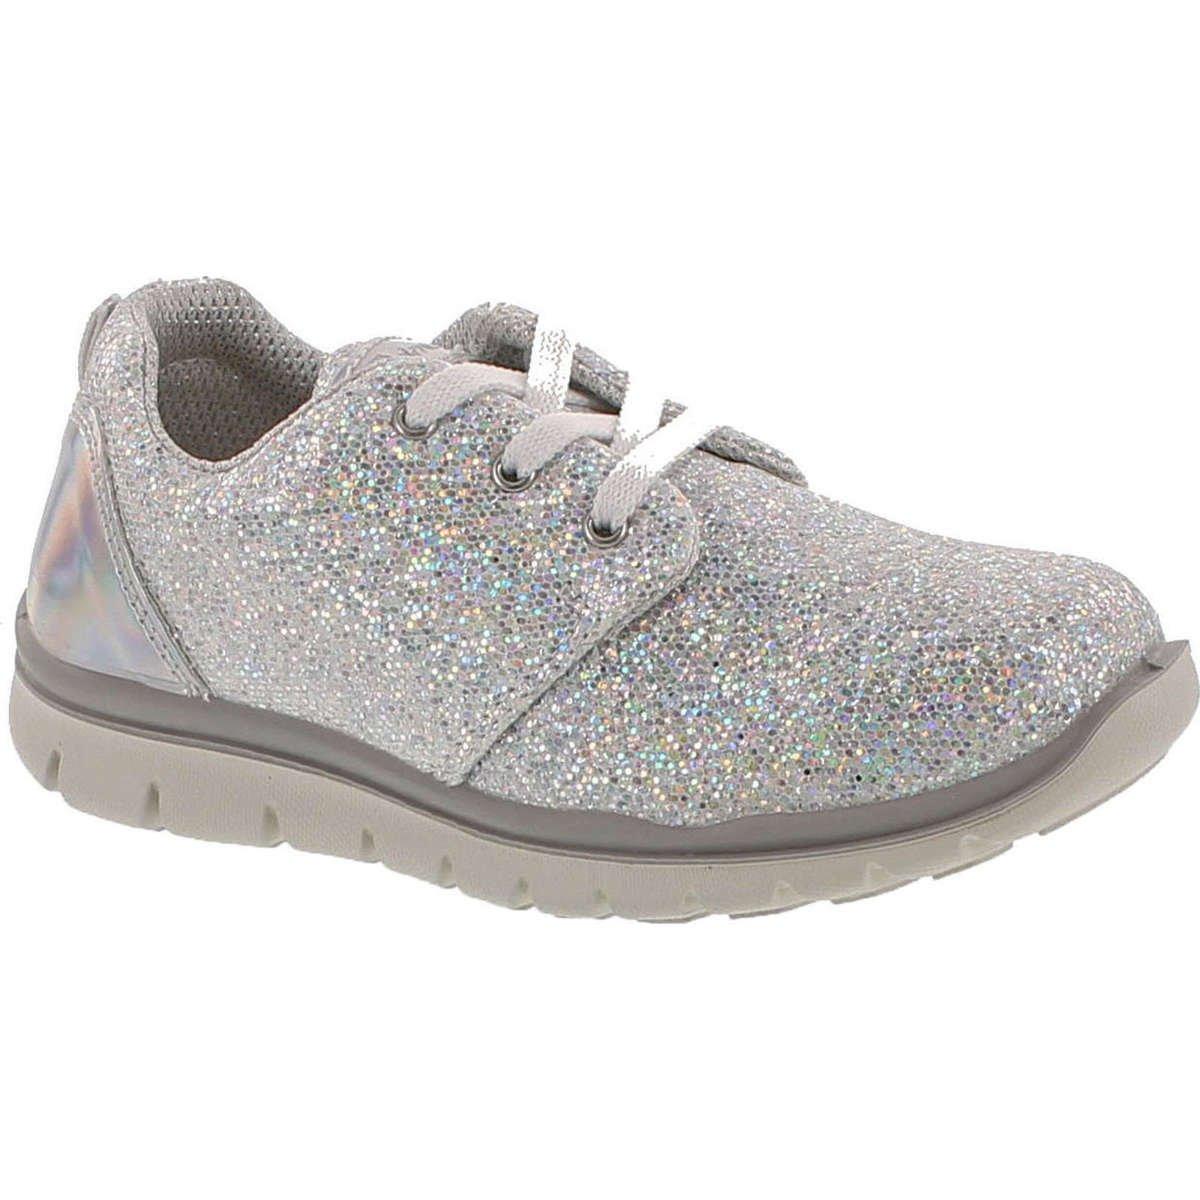 Primigi Girls 7585 Fashion Glitter Metallic Sneakers